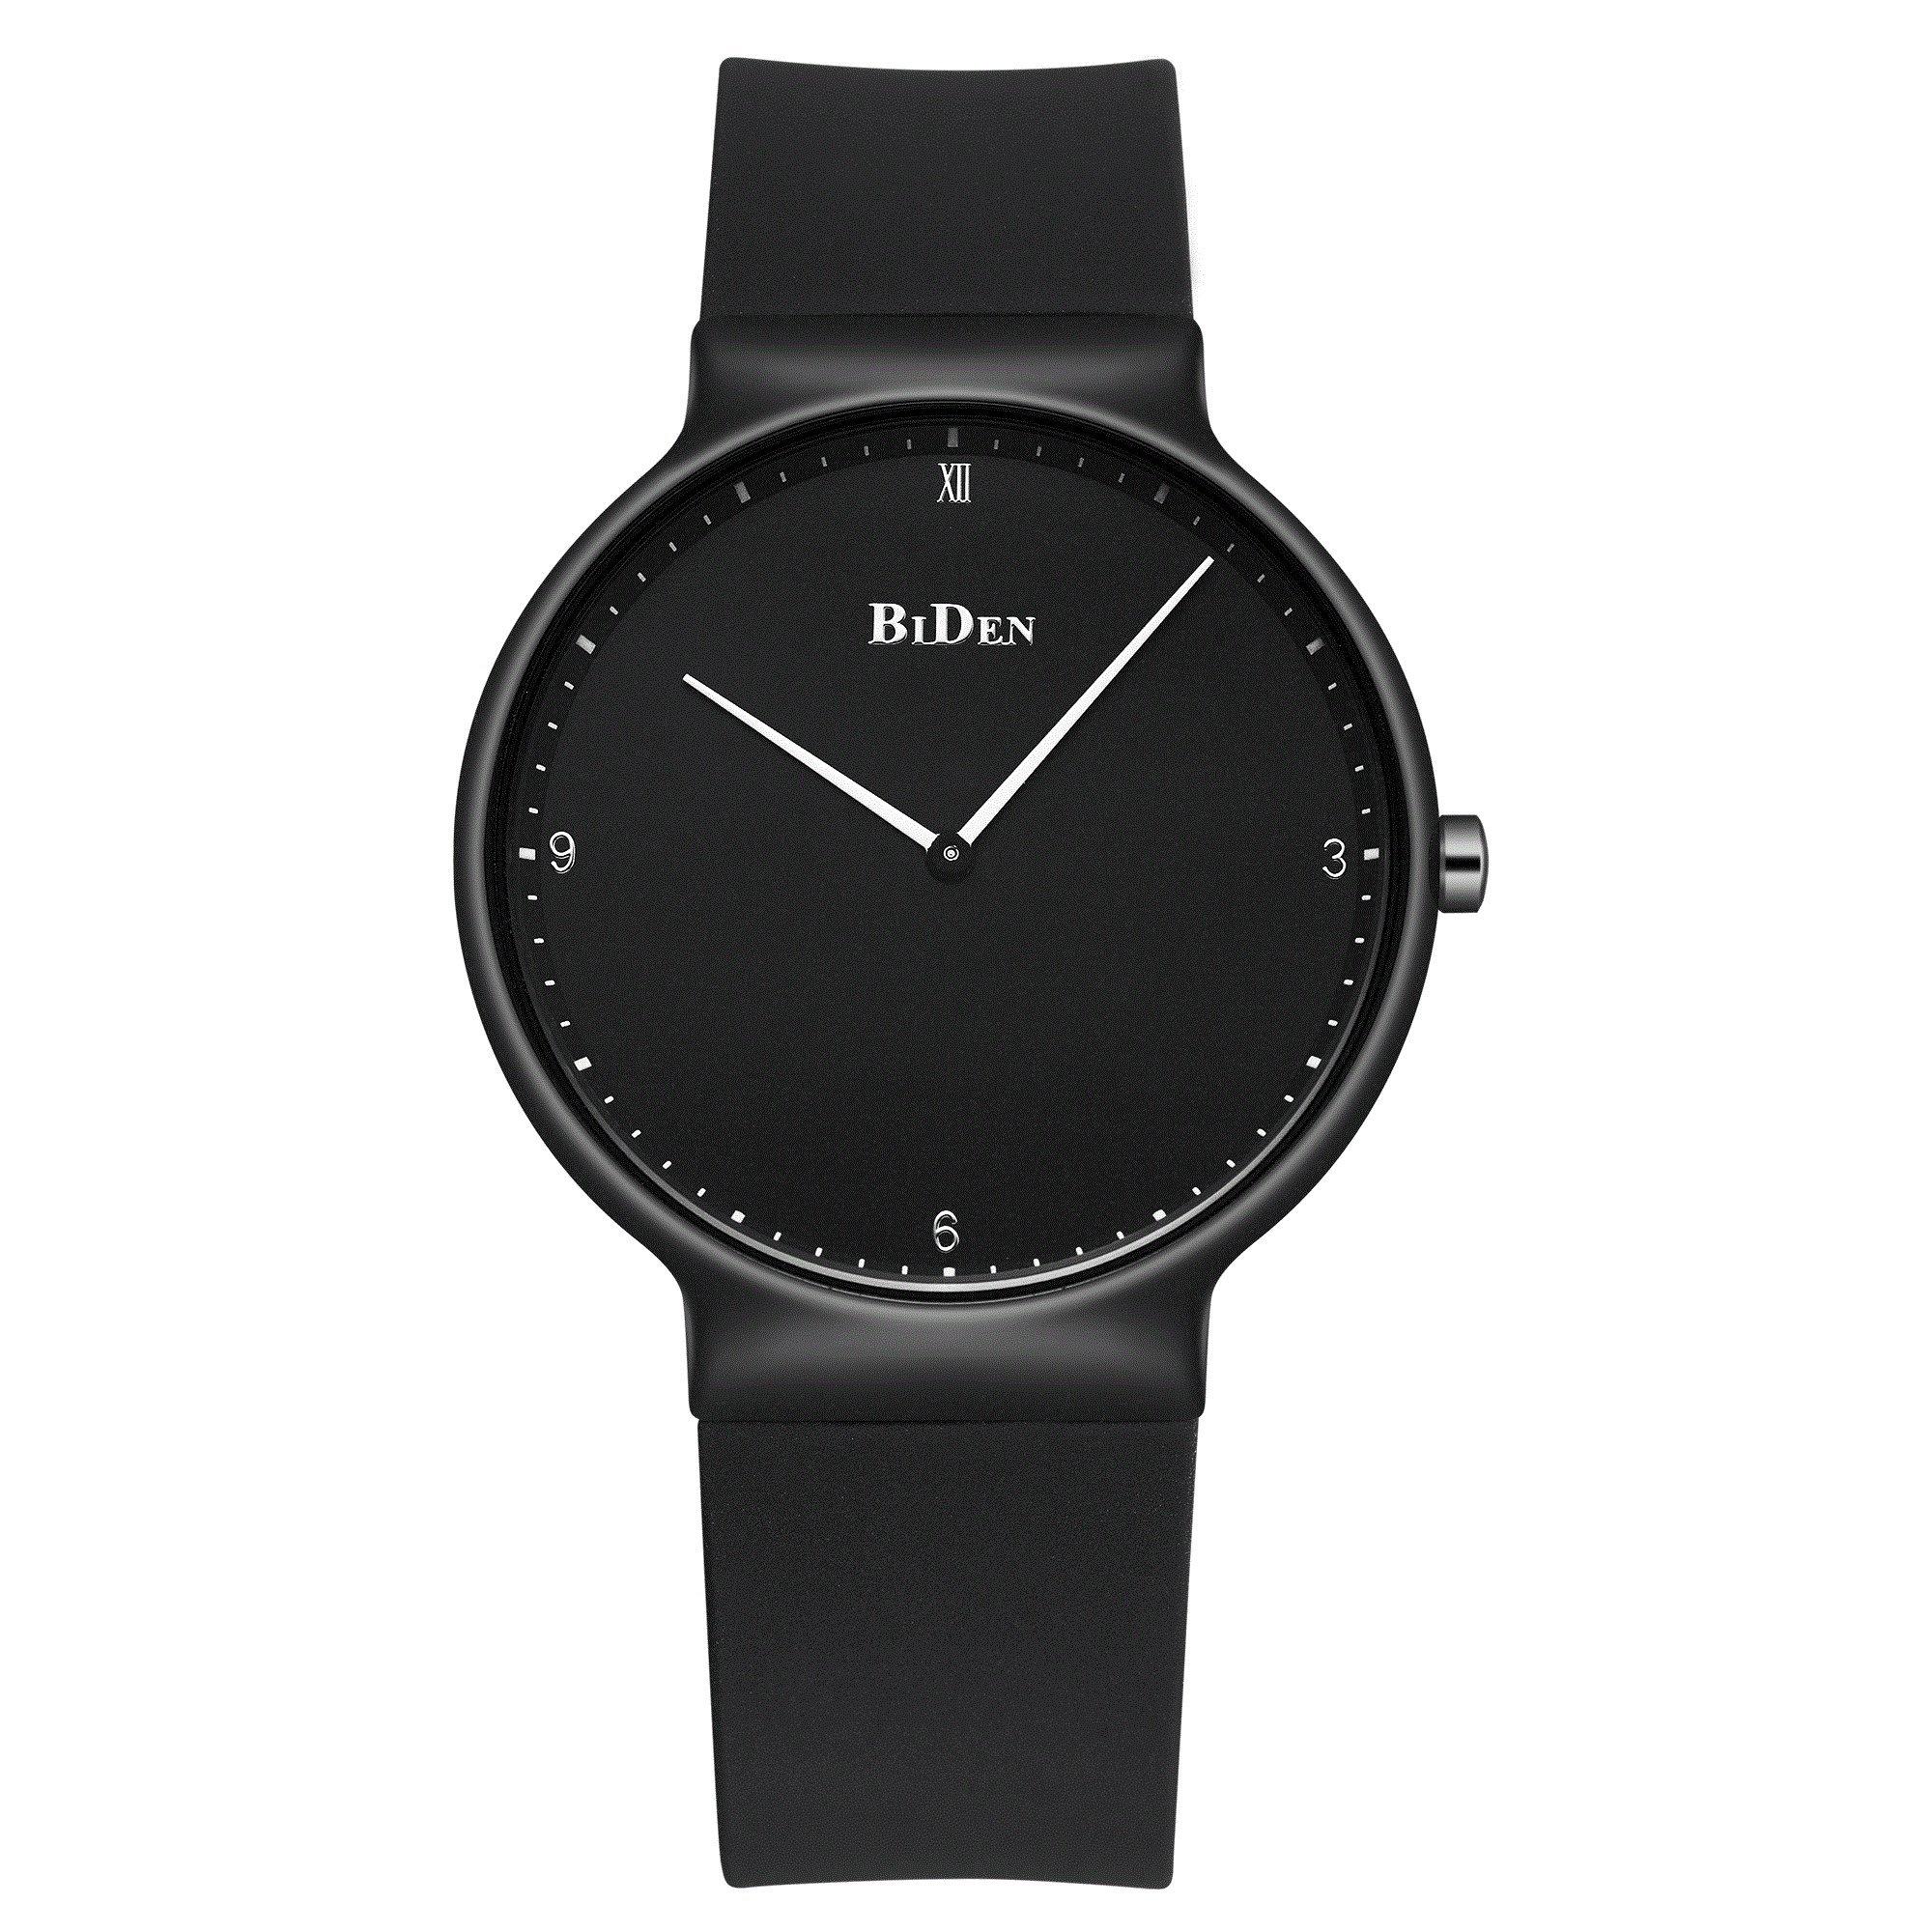 Womens Watches,Lady Simple Fashion Design Casual Business Dress Analogue Quartz Silicone Wrist Watch (Black)